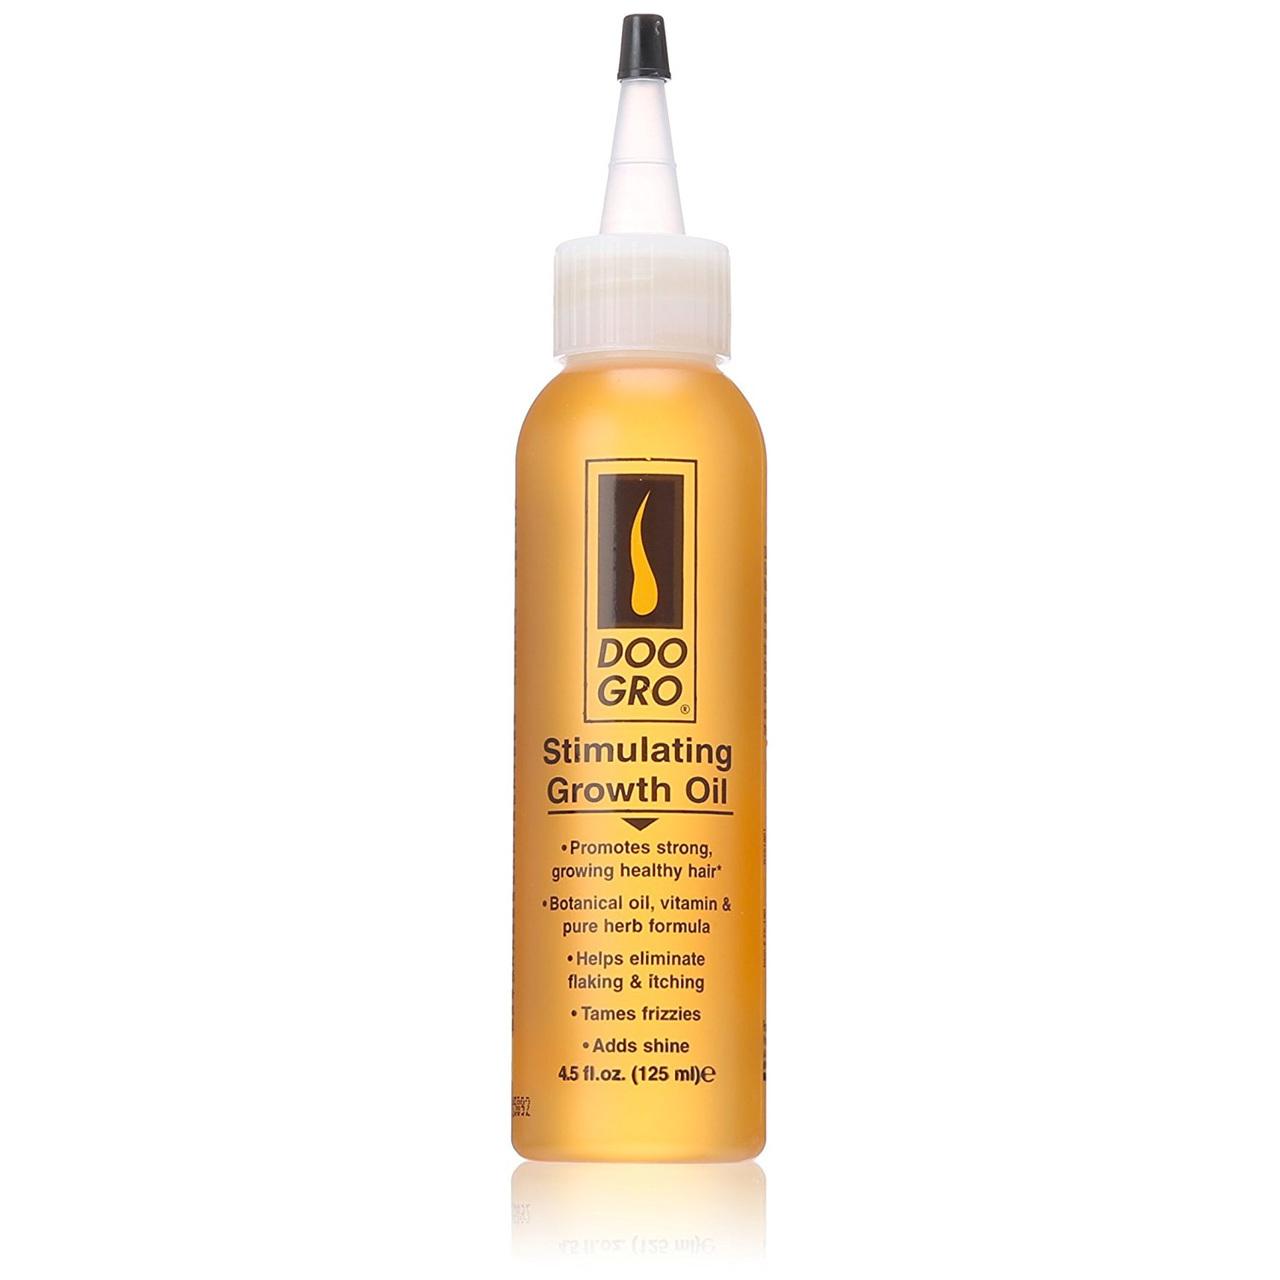 doo-gro-stimulating-growth-oil